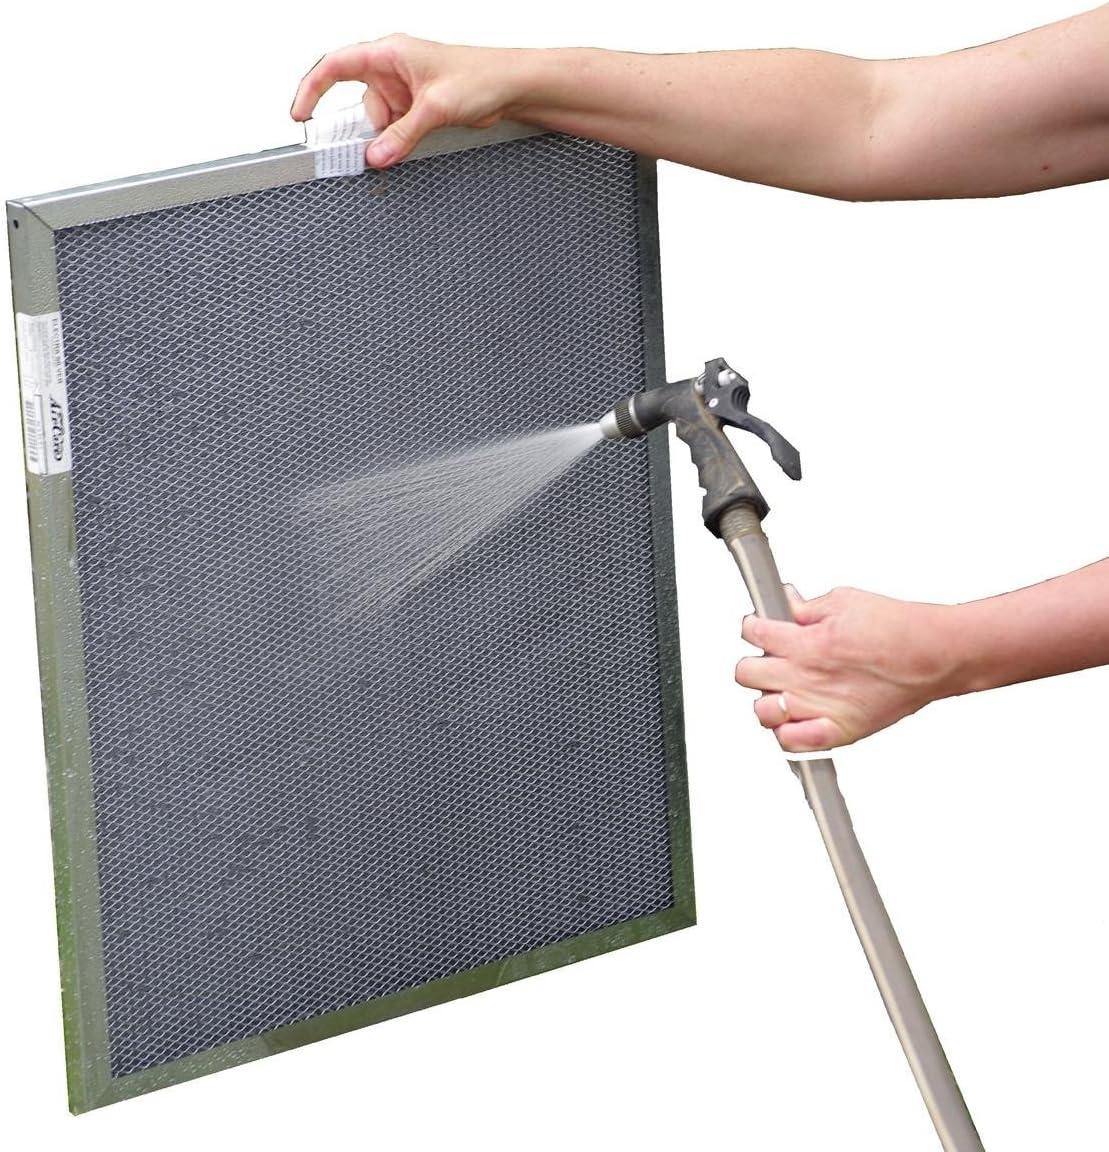 Amazon Com 21x22x1 Electrostatic Washable Permanent A C Furnace Air Filter Reusable Silver Frame Appliances